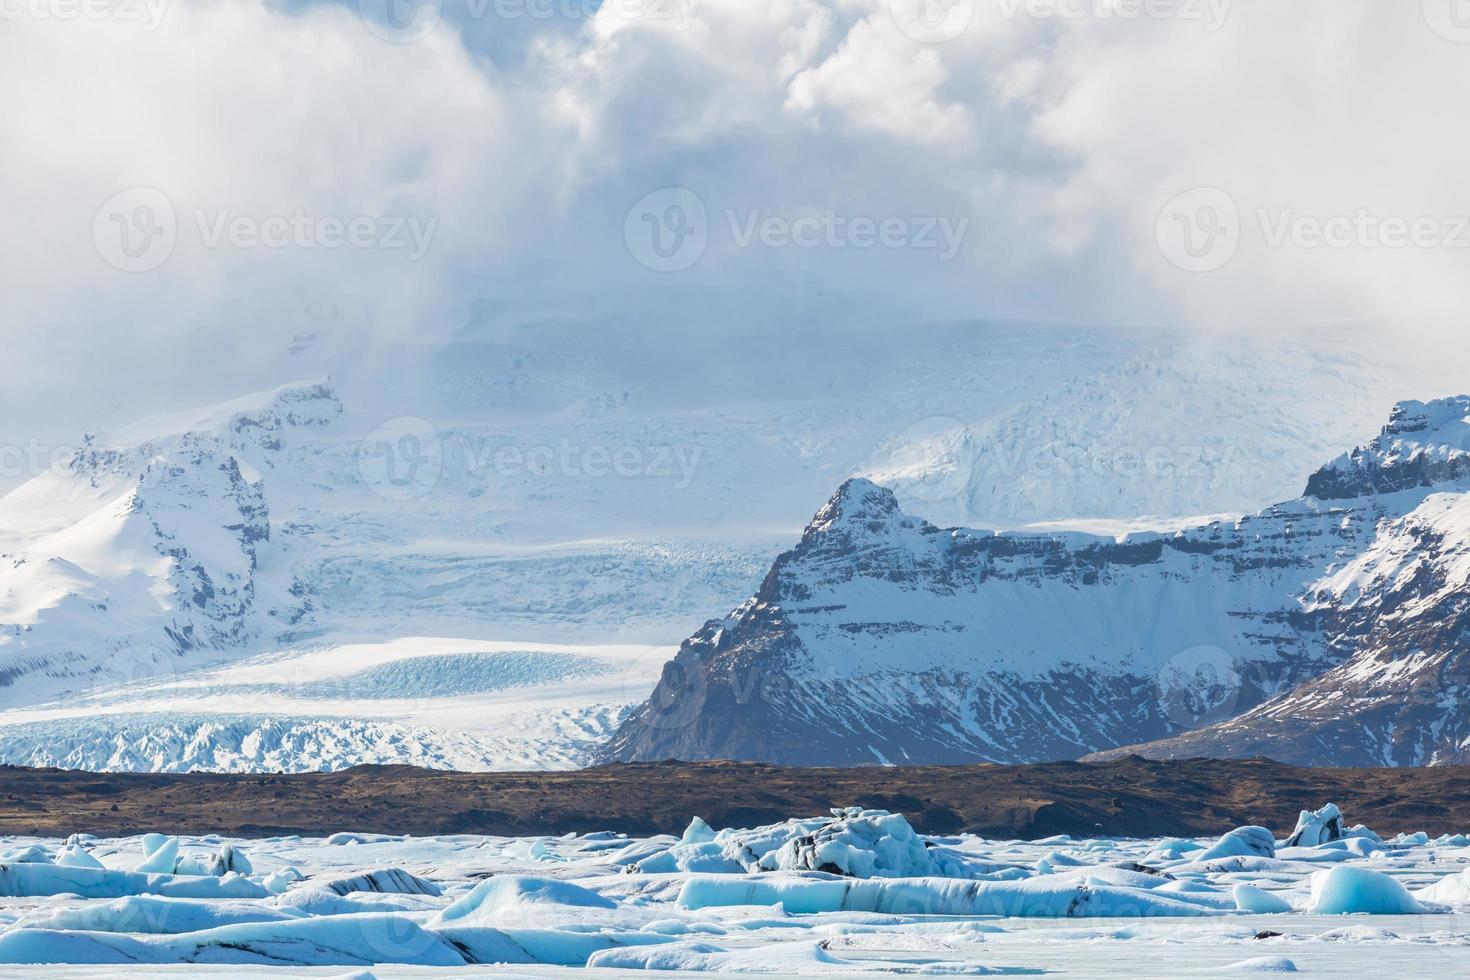 ghiacciaio vatnajokull islanda foto